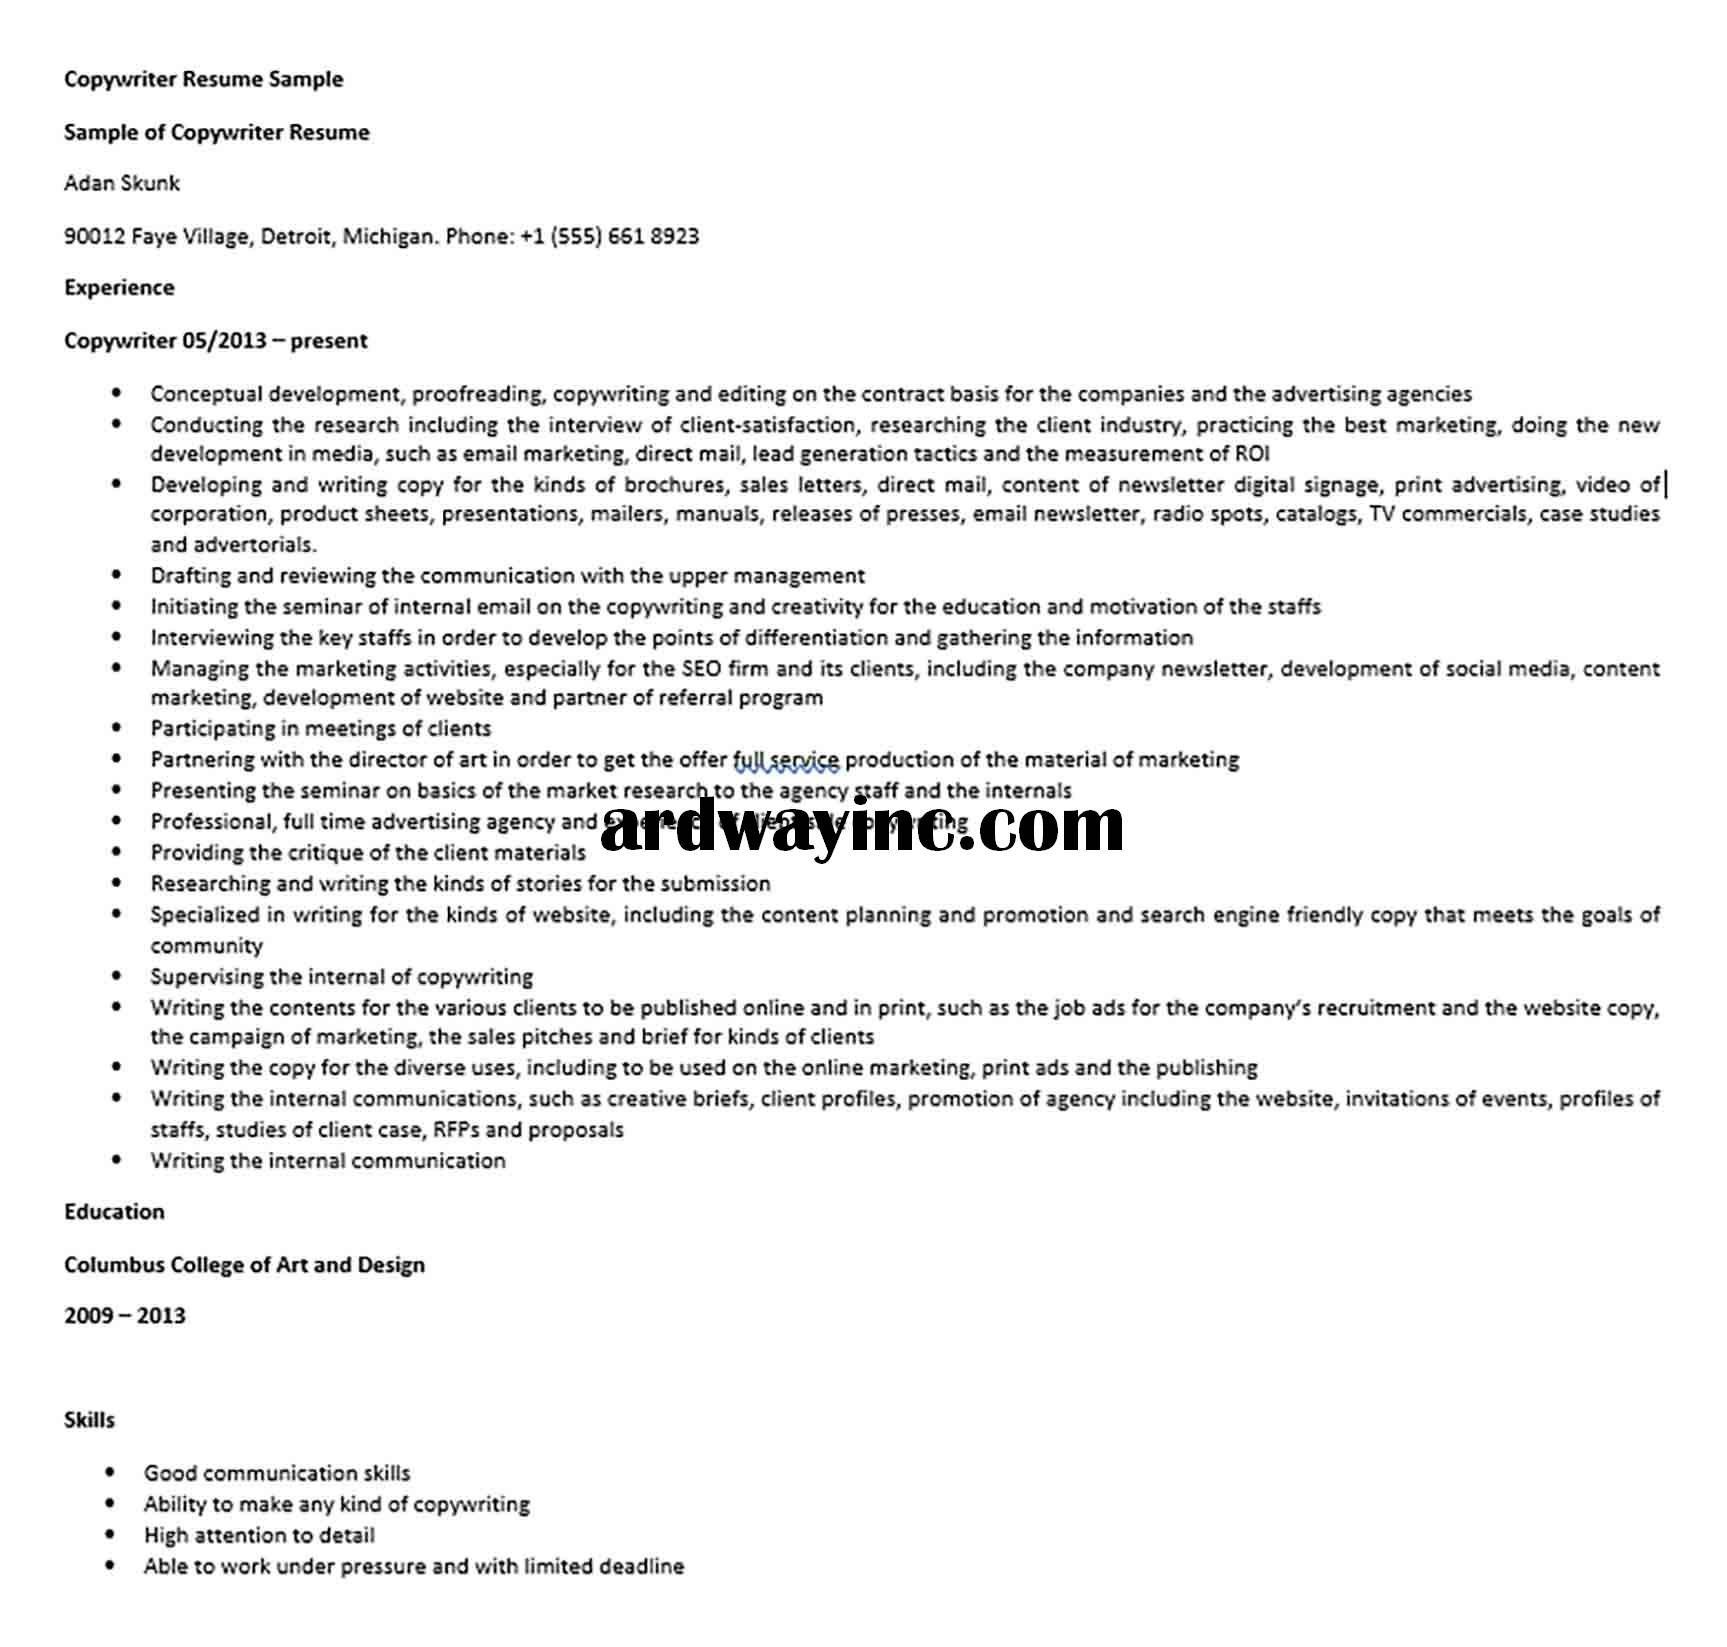 Copywriter Resume Sample Copywriting Resume Create A Resume